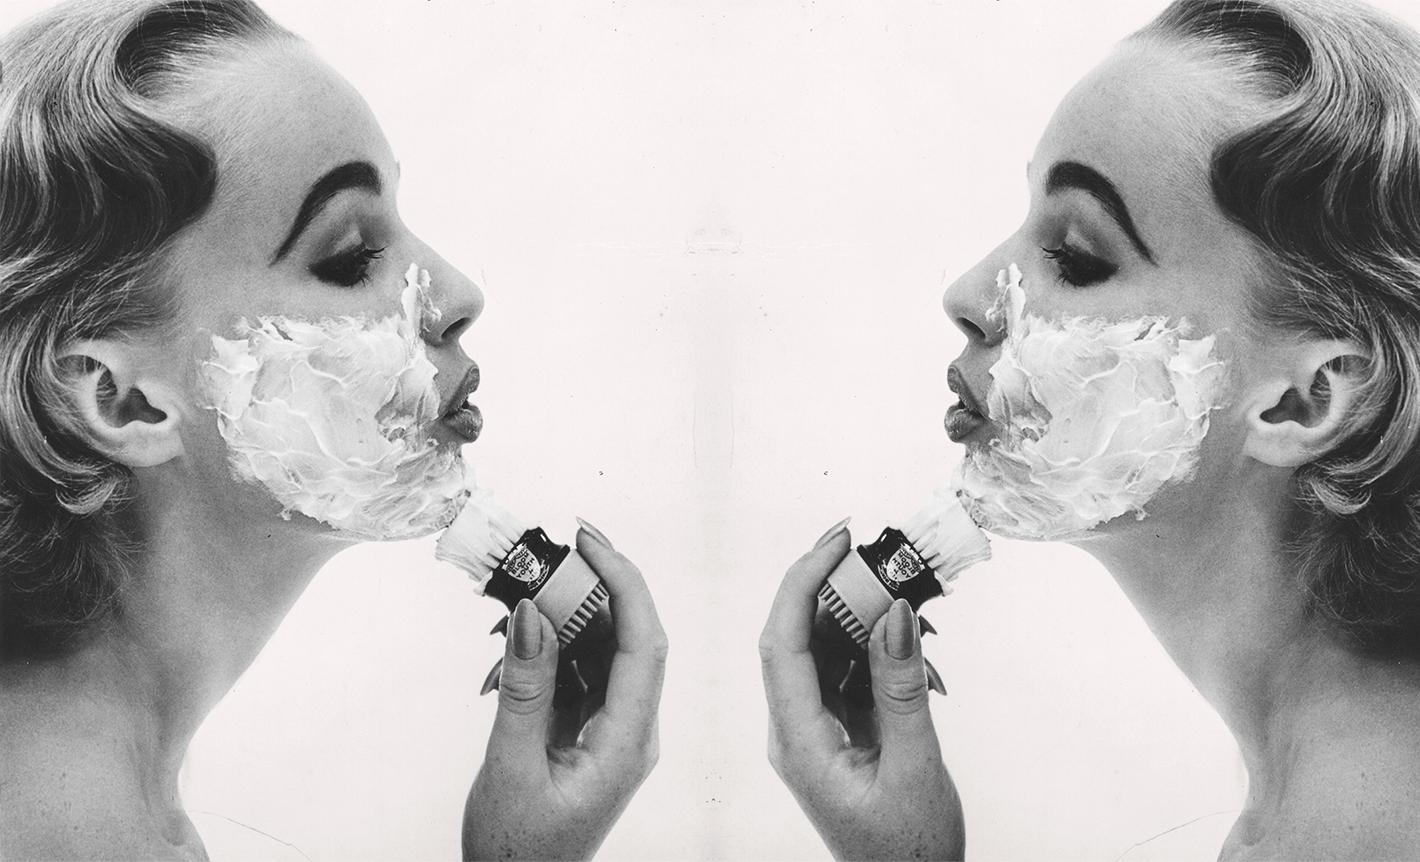 zene briju lice_cover